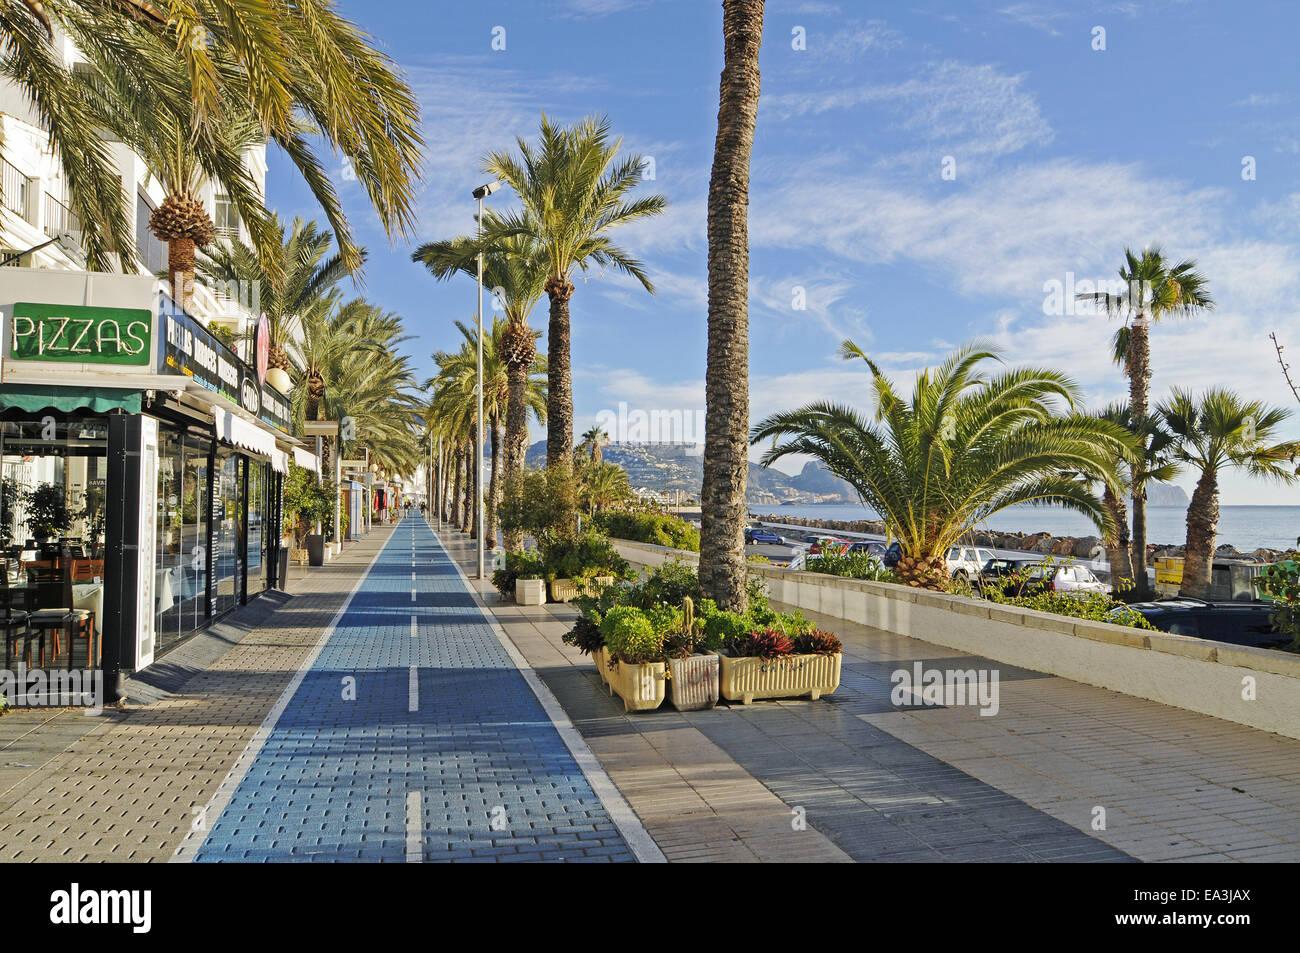 waterside promenade, Altea, Spain - Stock Image